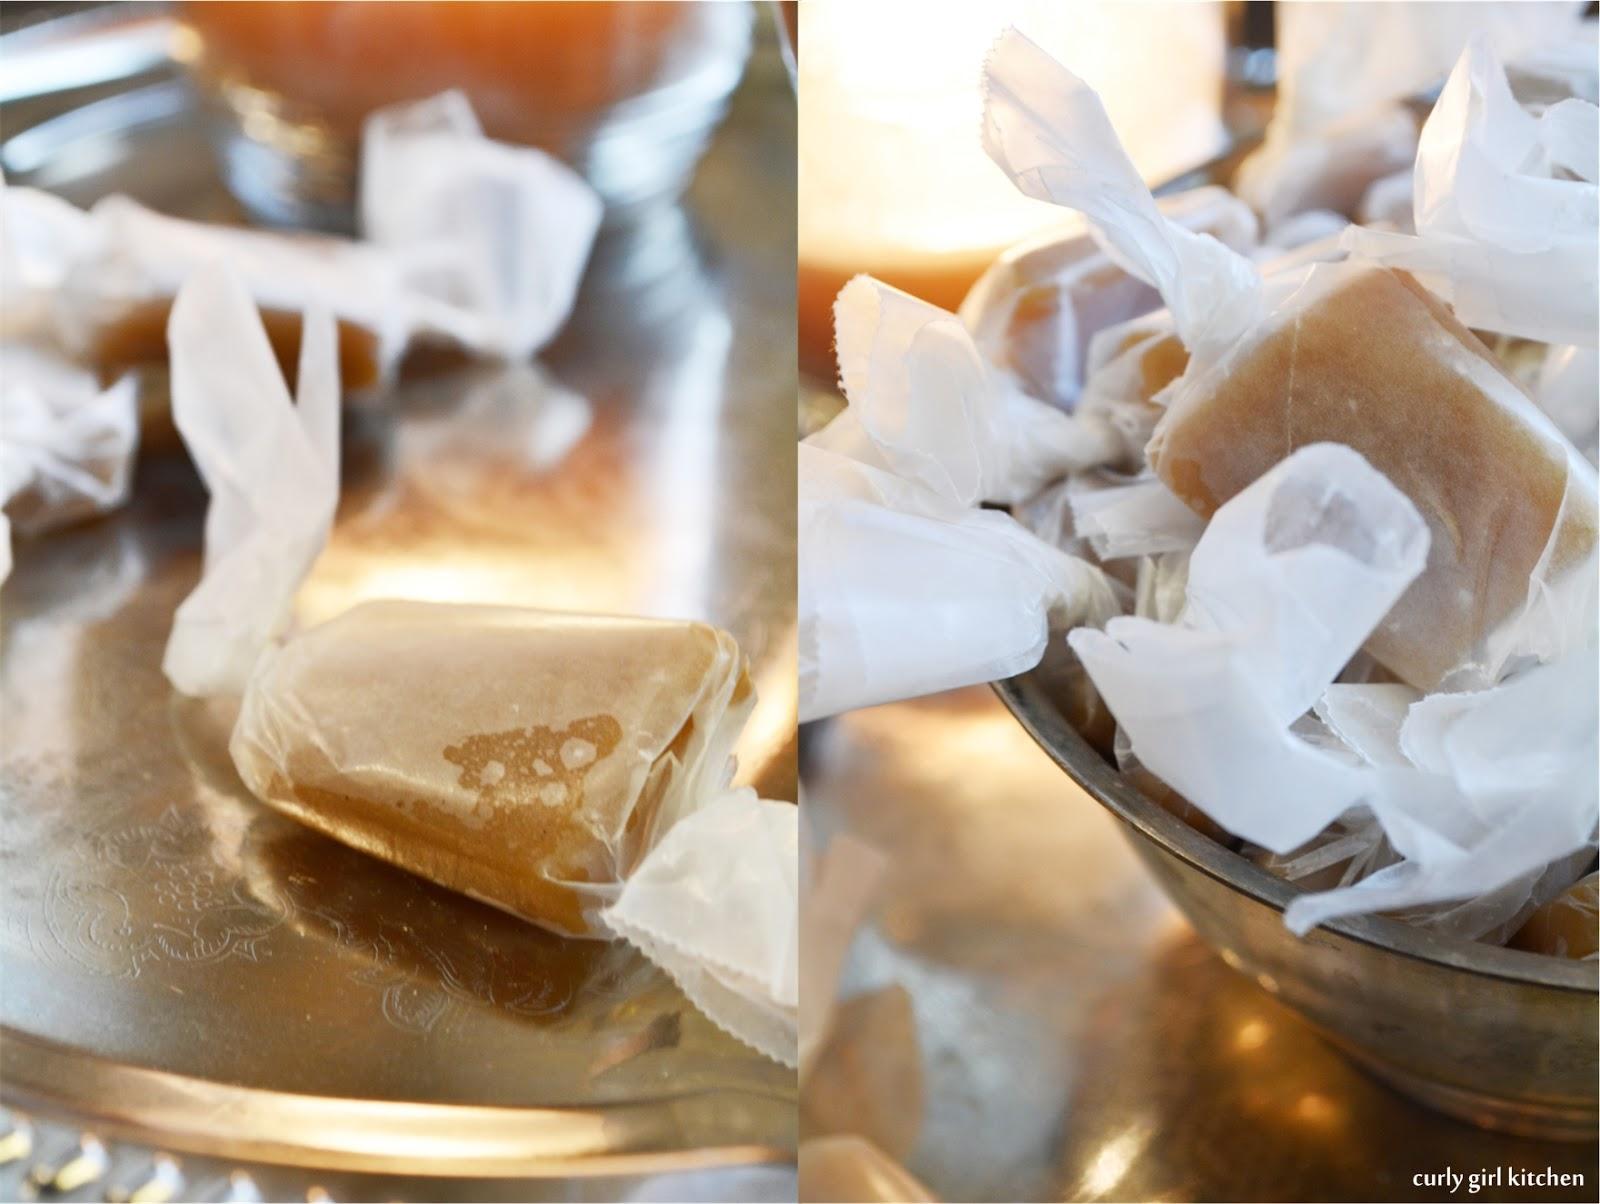 Curly Girl Kitchen: Vanilla Bean Salted Caramels